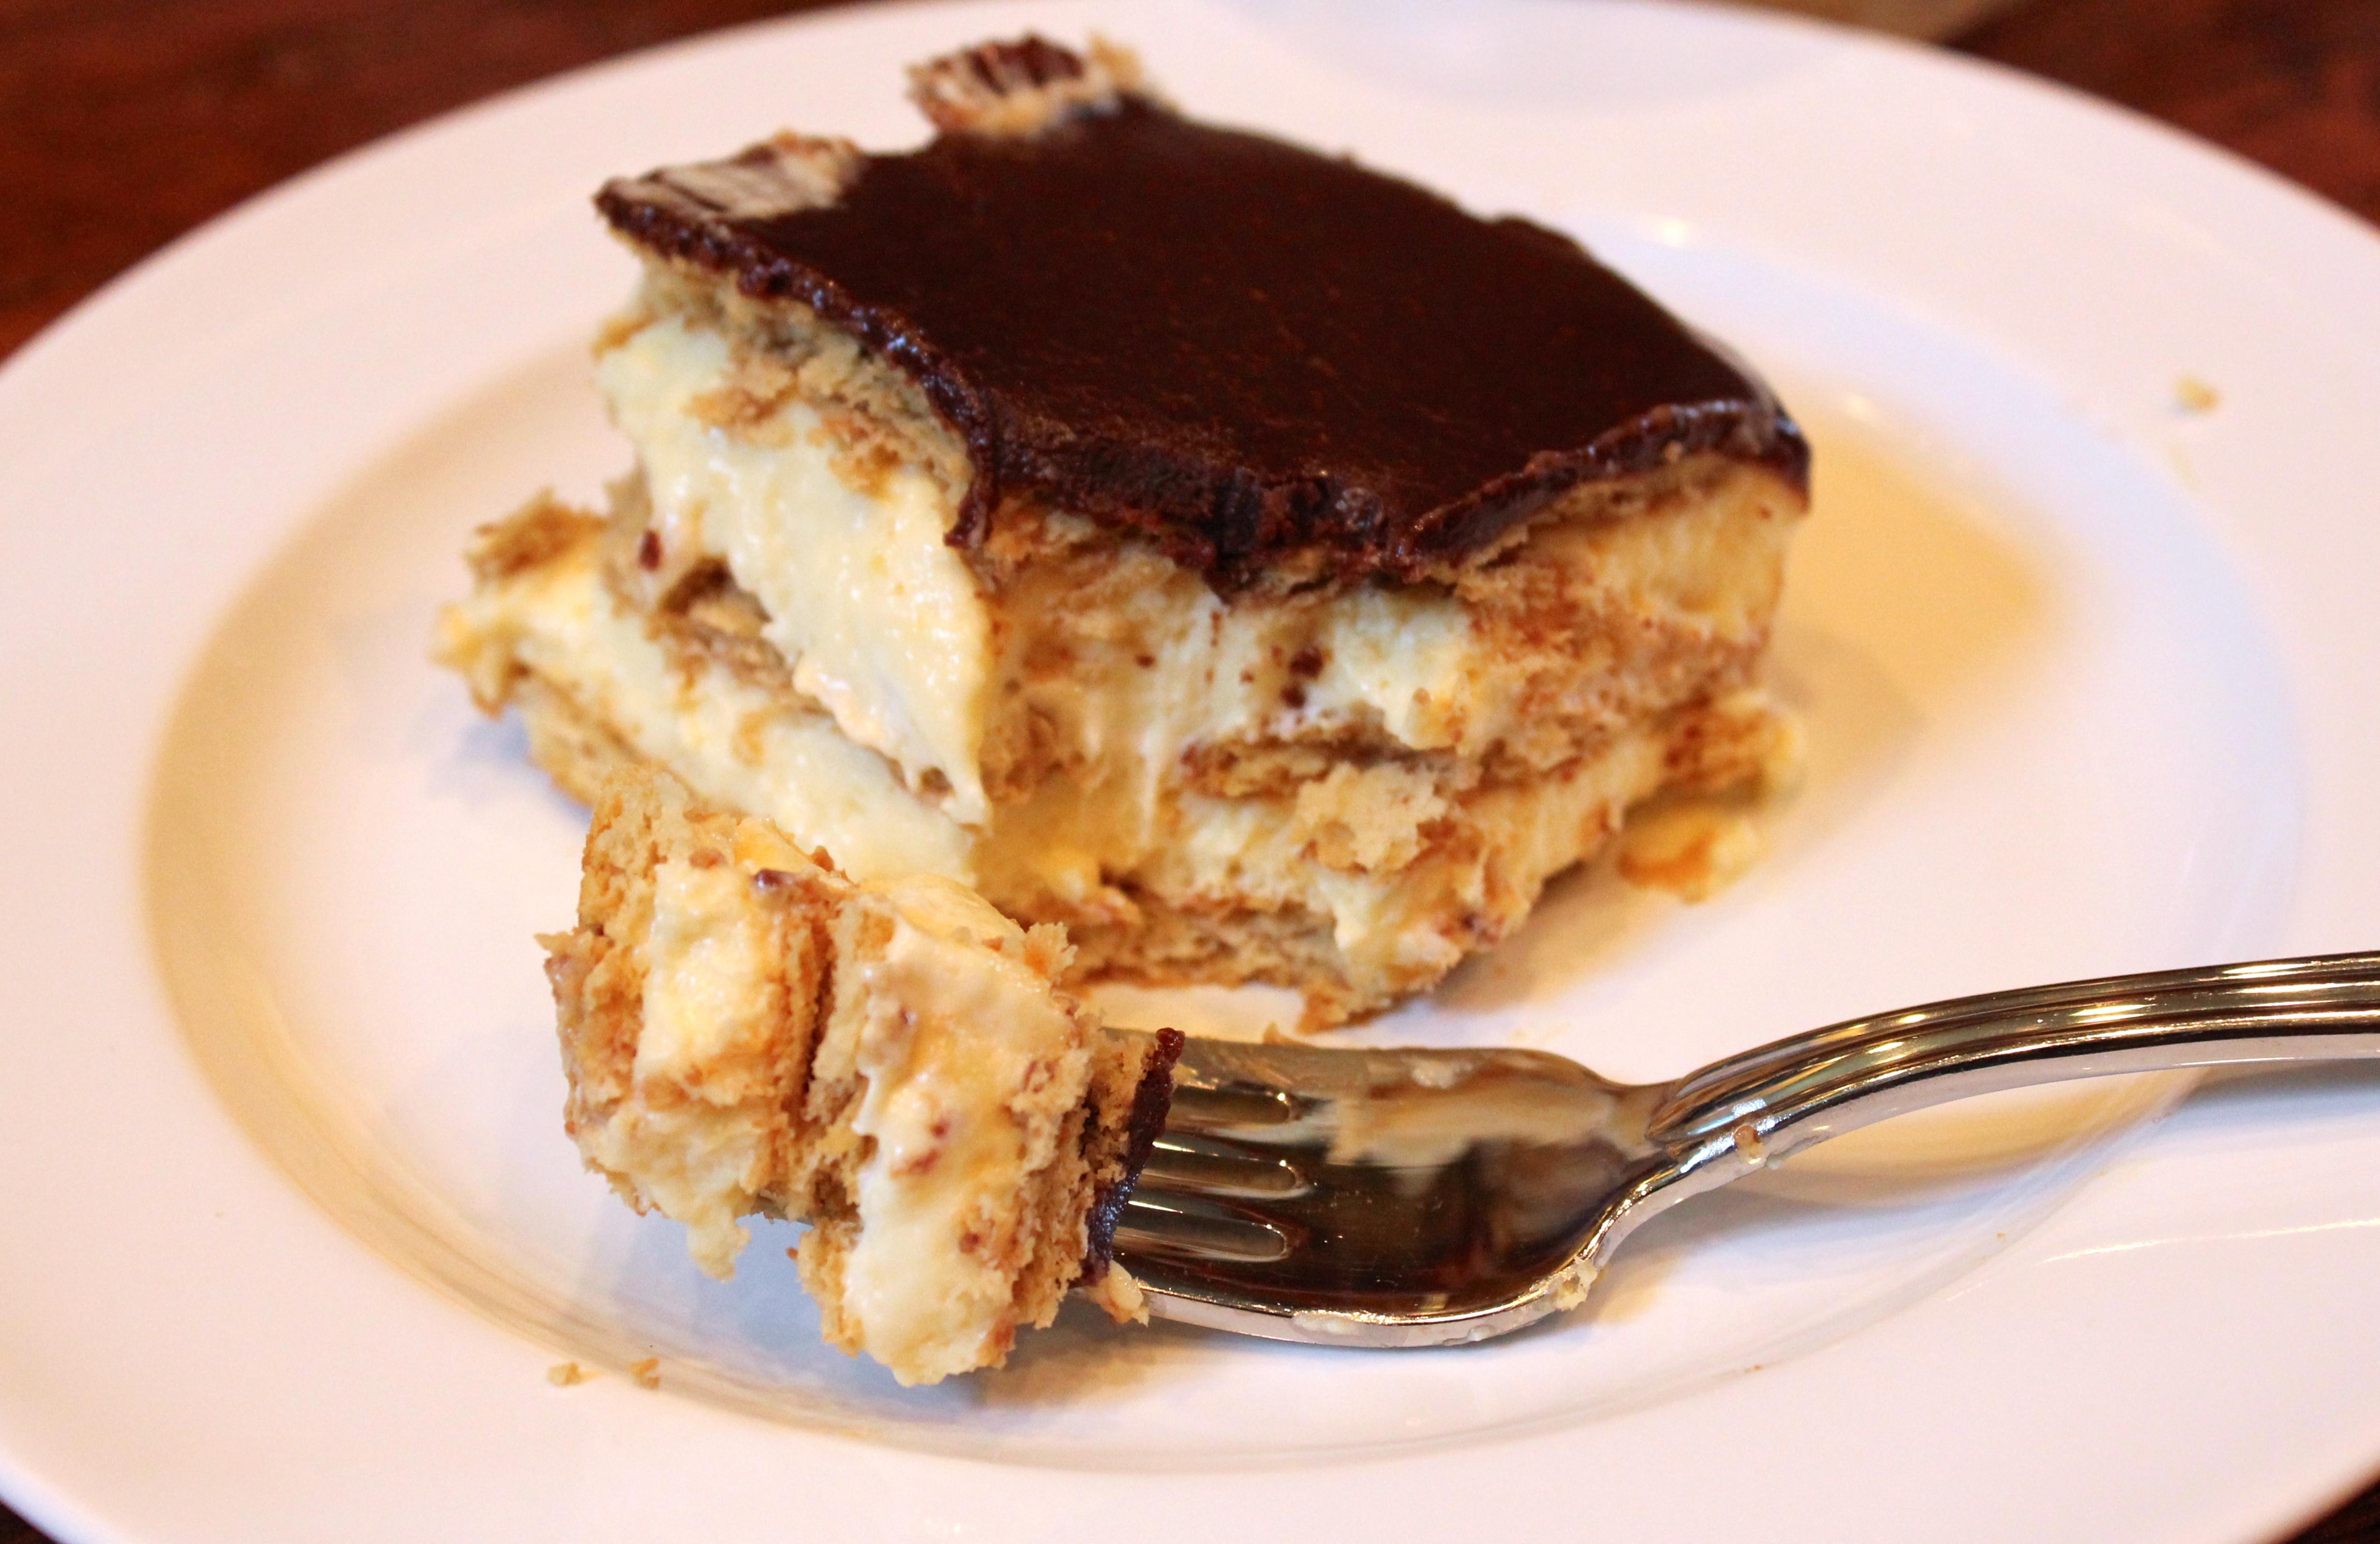 Chocolate Eclair Dessert – Dallas Duo Bakes